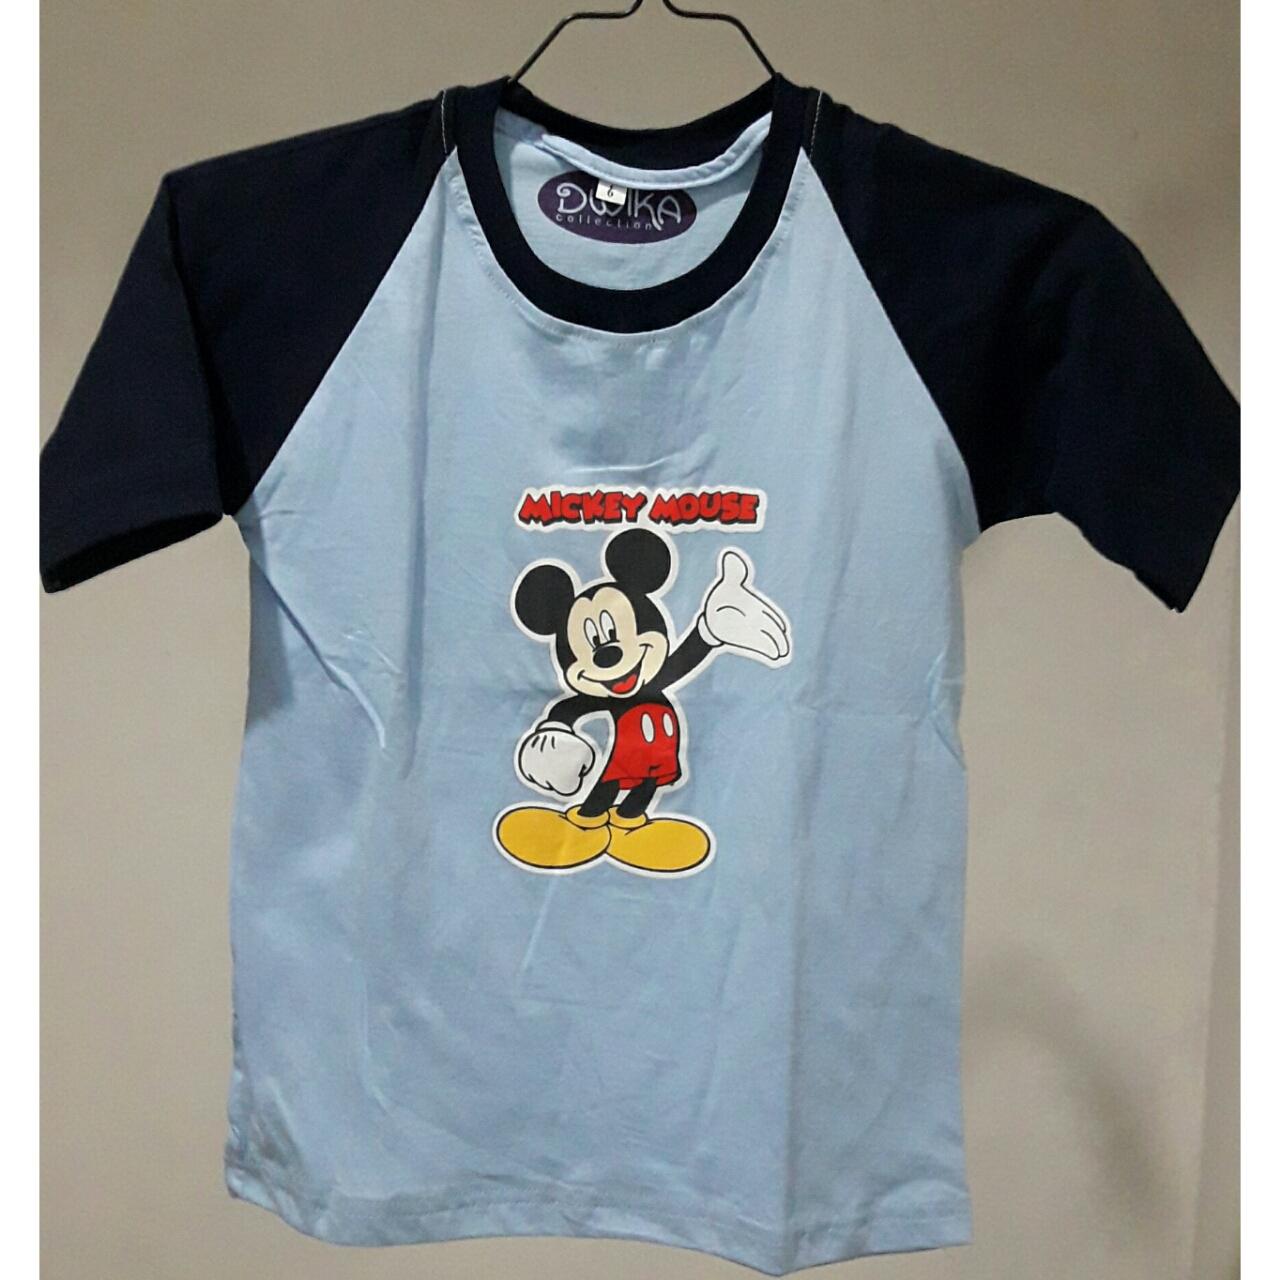 Hylmi Shop Line Baju Anak Mikimouse Kaos Mickey Mouse Size 6